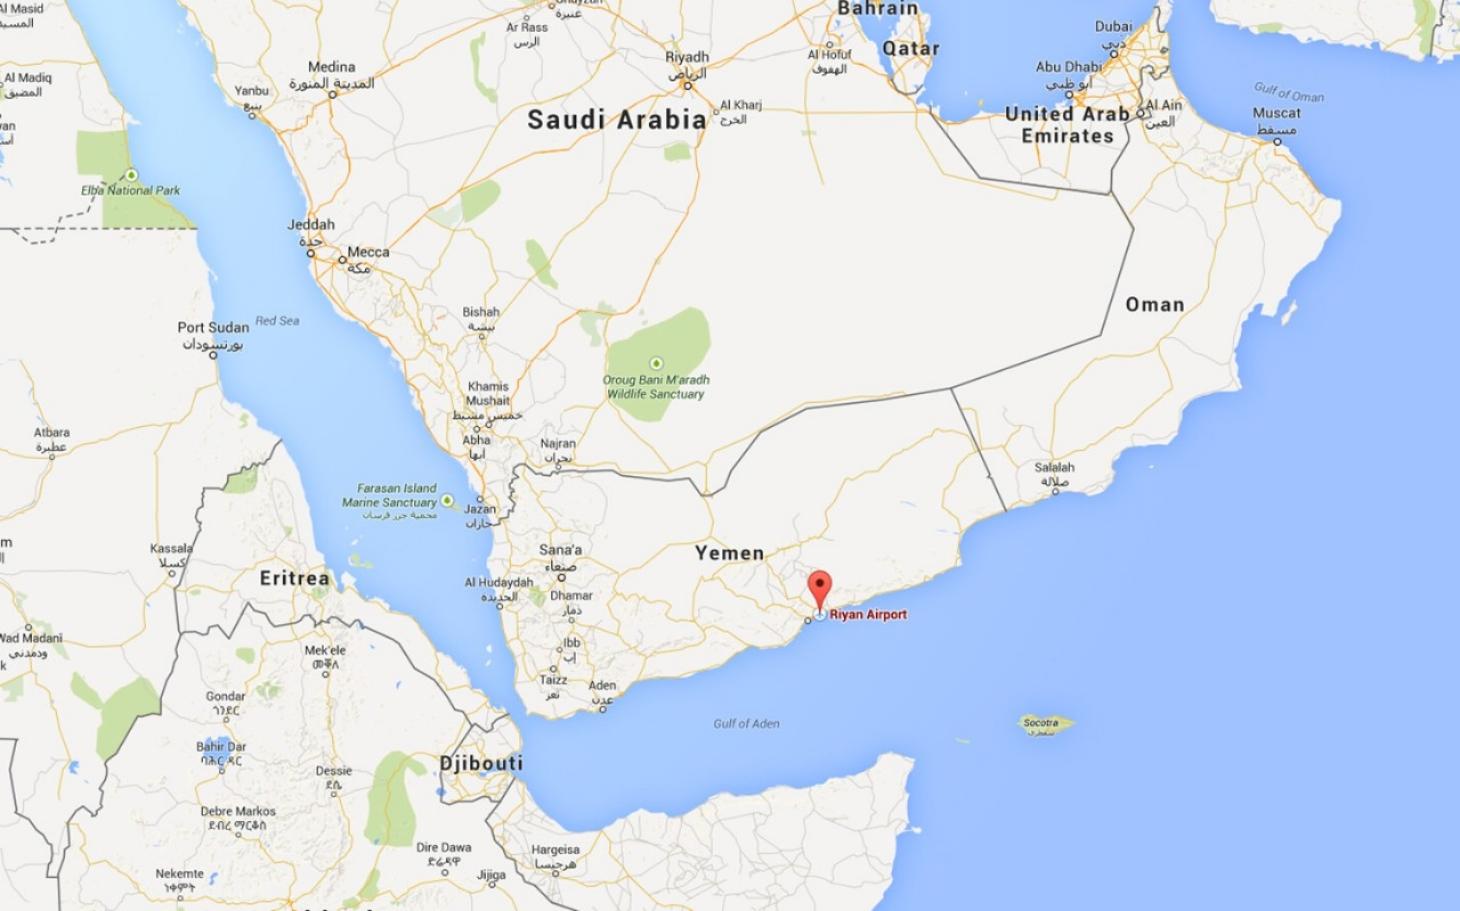 Al-Qaeda Takes Over Airport in Yemen | Al Jazeera America